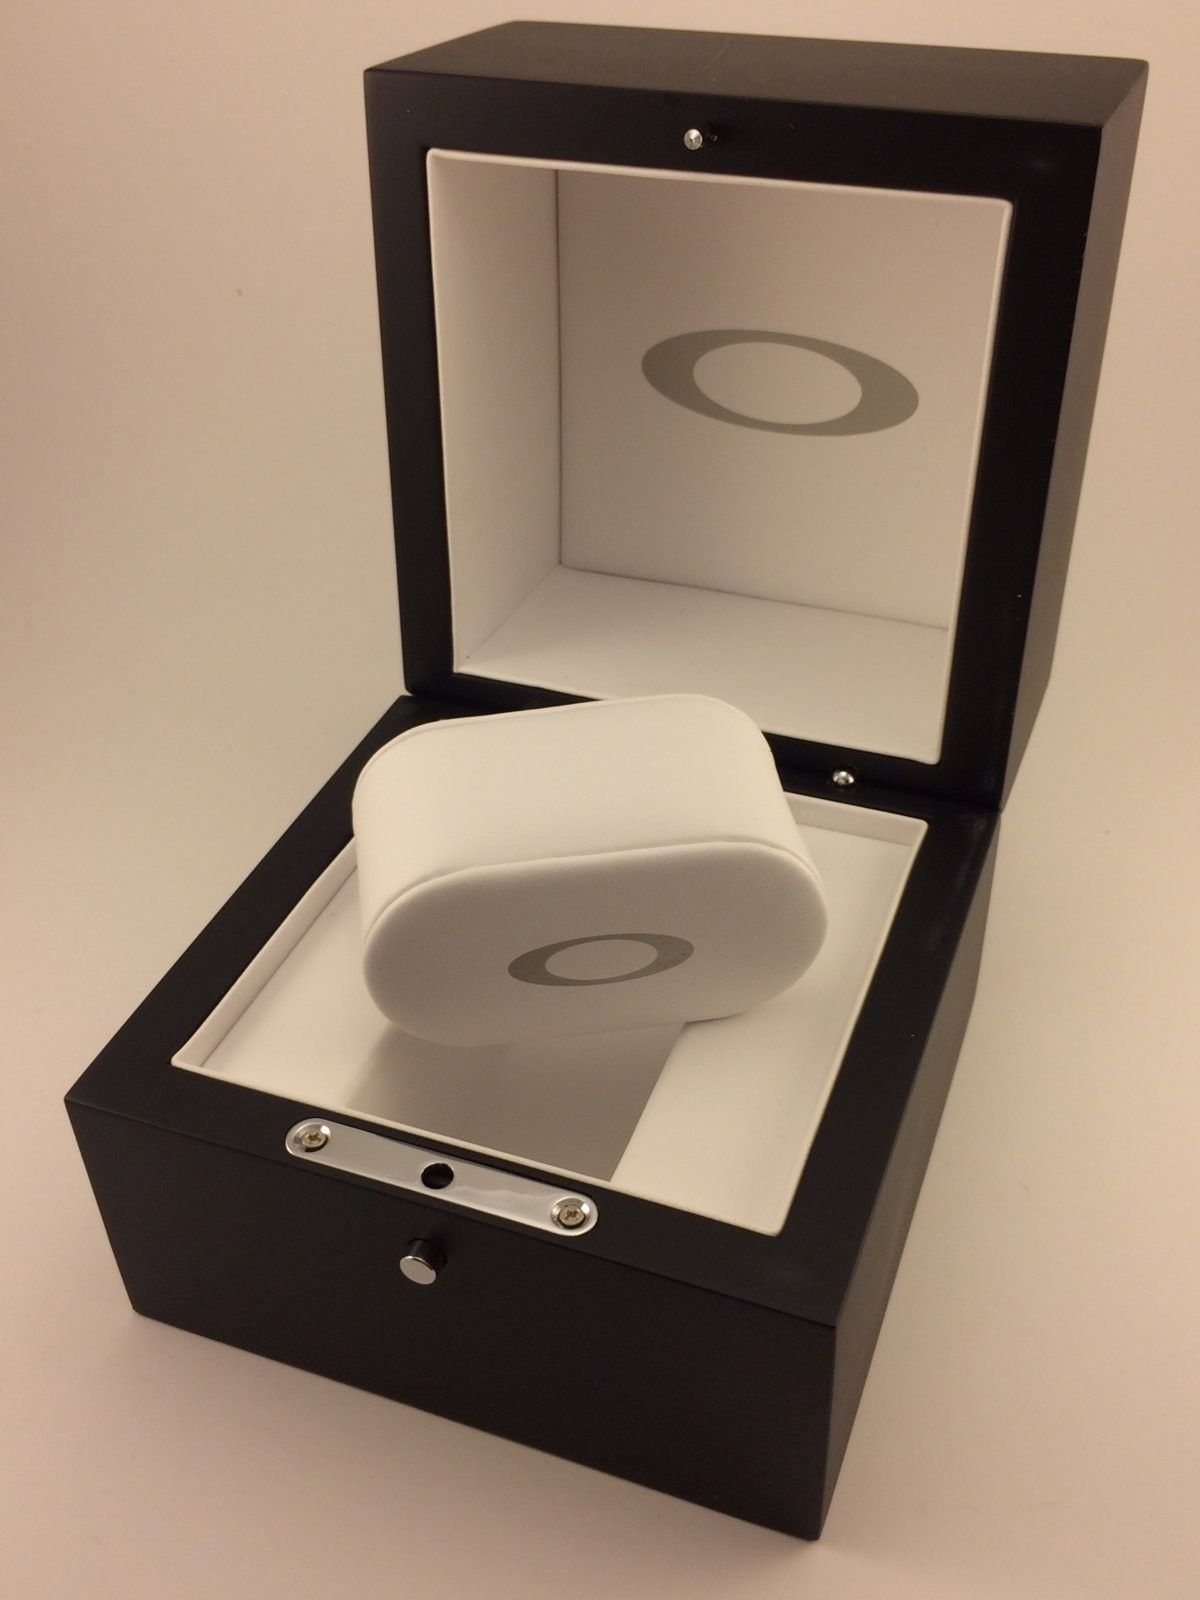 Minute Machine Wooden Box - MM box 705.JPG